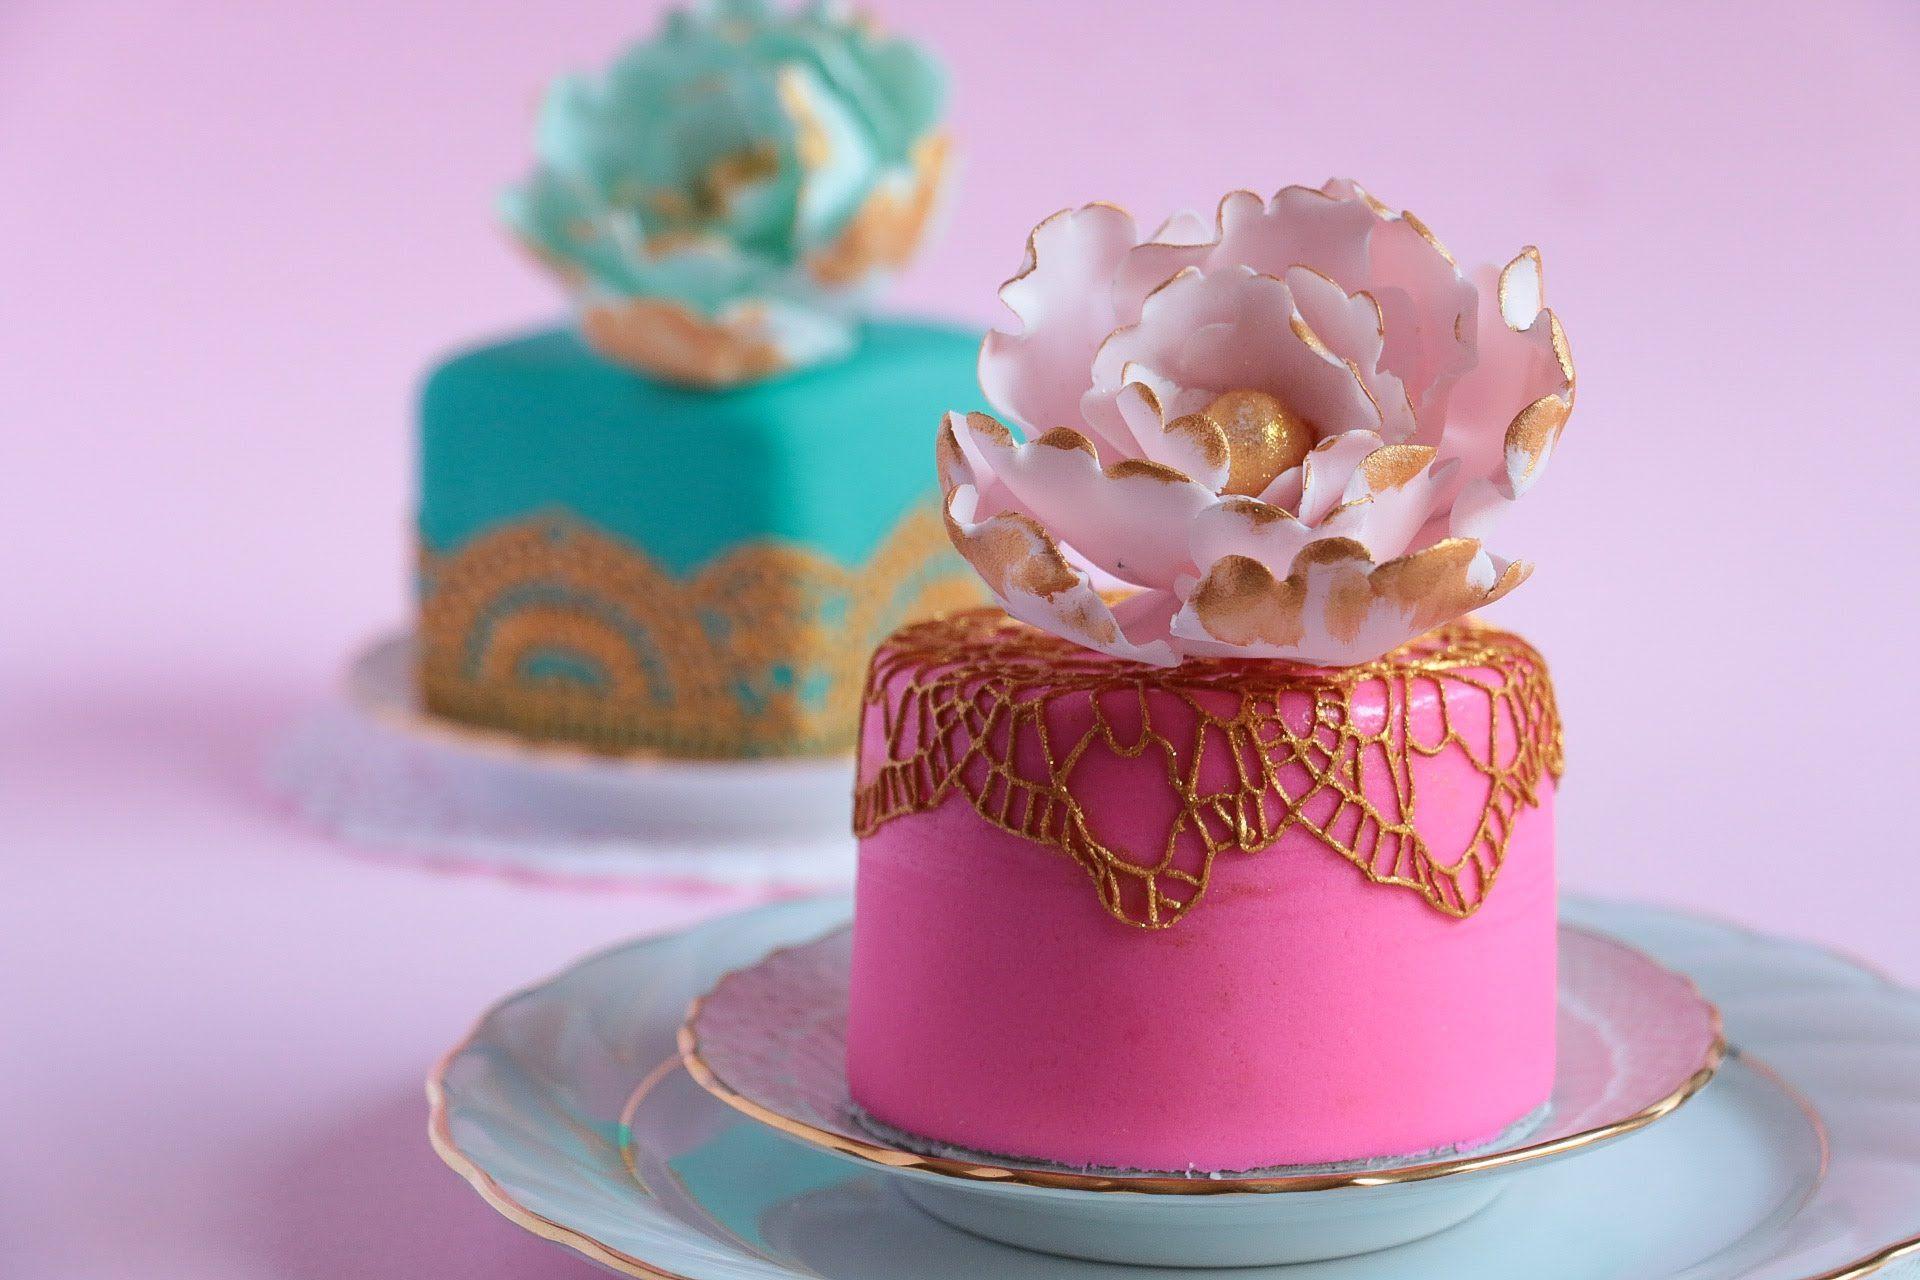 How To Make Mini Fondant Cakes Mini Cakes Tutorial Cake Mini Wedding Cakes